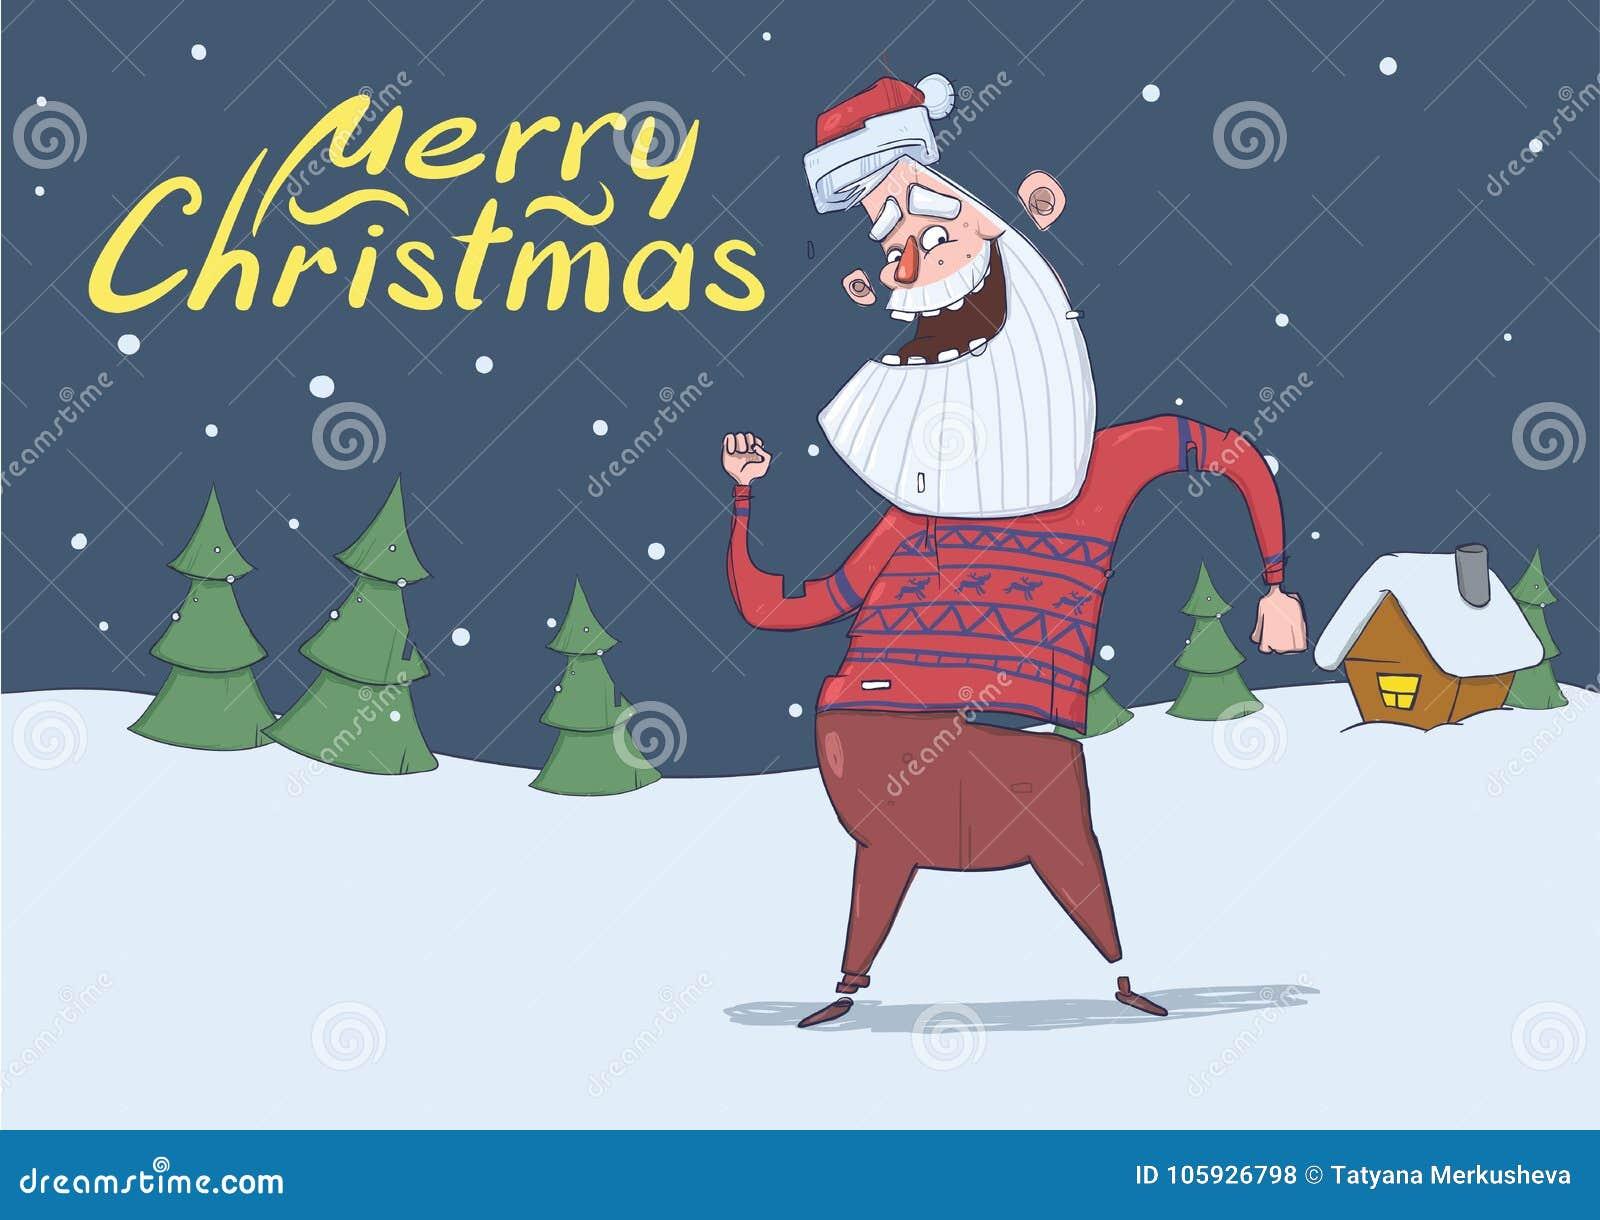 Christmas Card Of Smiling Santa Claus In Deer Sweater Dancing In The ...